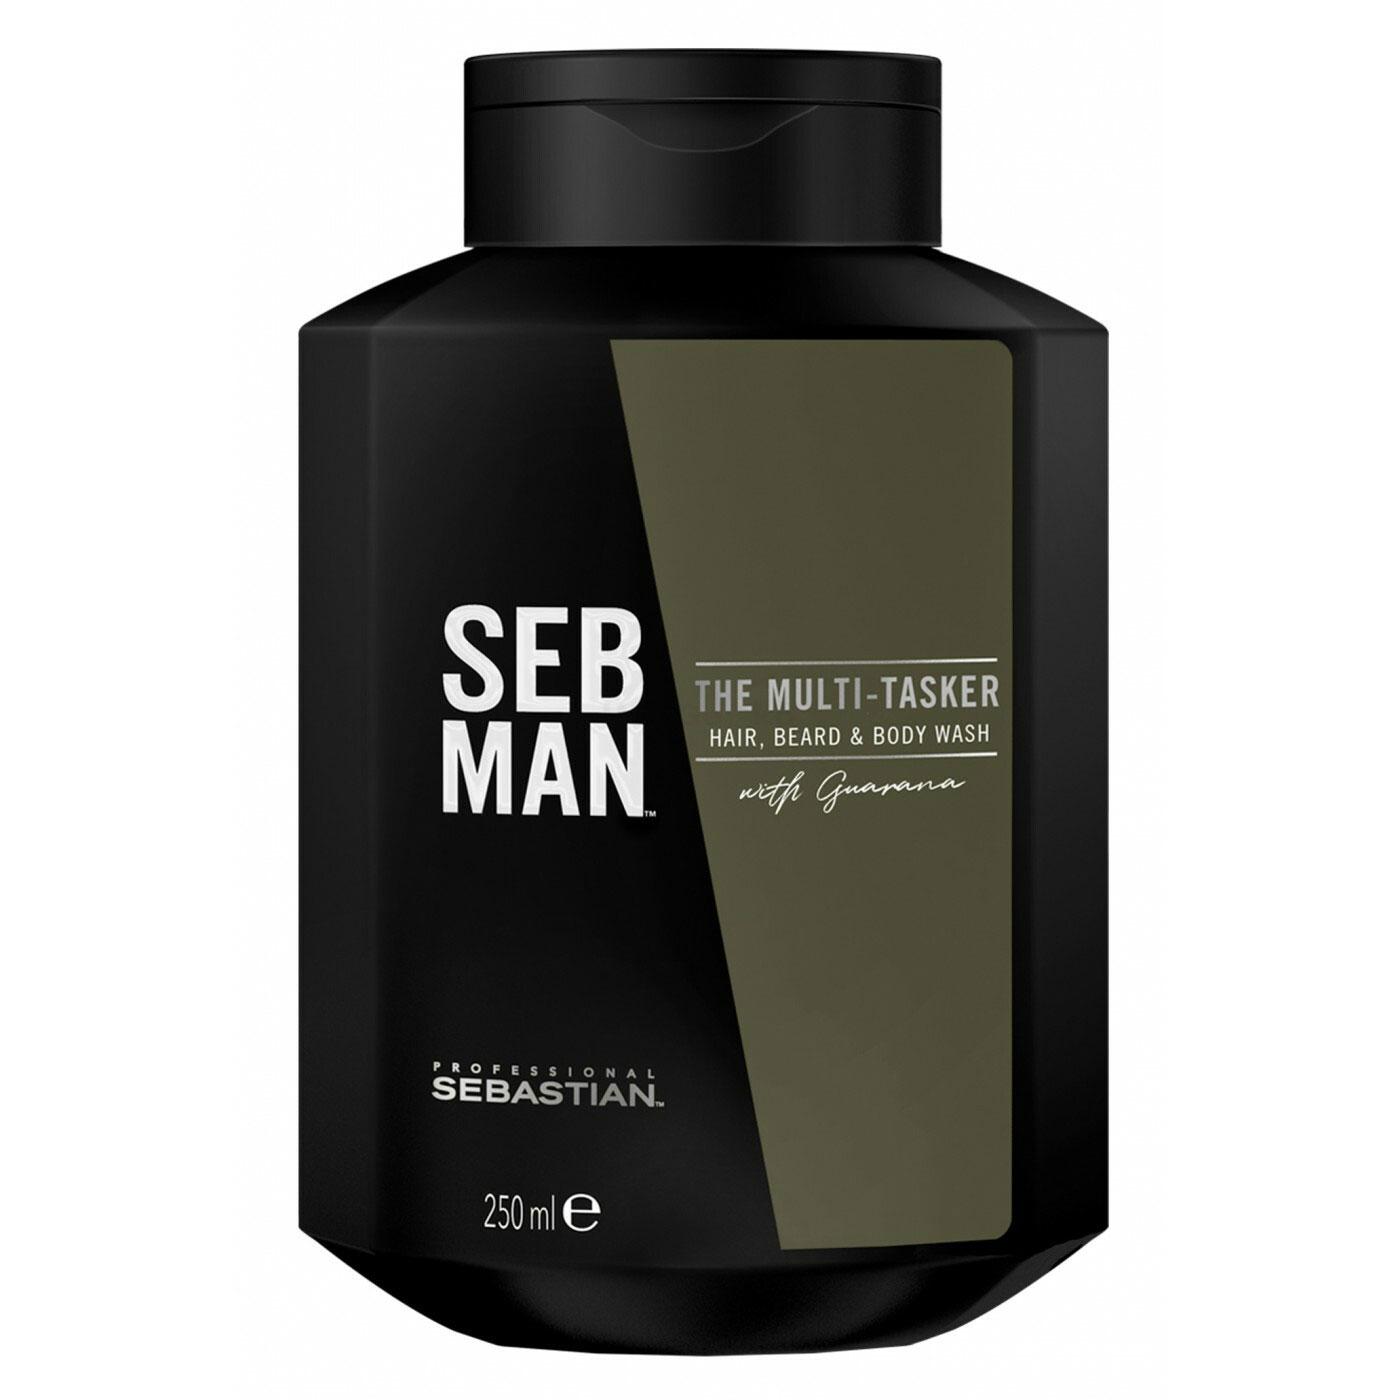 Sebastian SEB MAN The Multi-Tasker 3in1 Shampoo für Haar, Bart und Körper 250ml